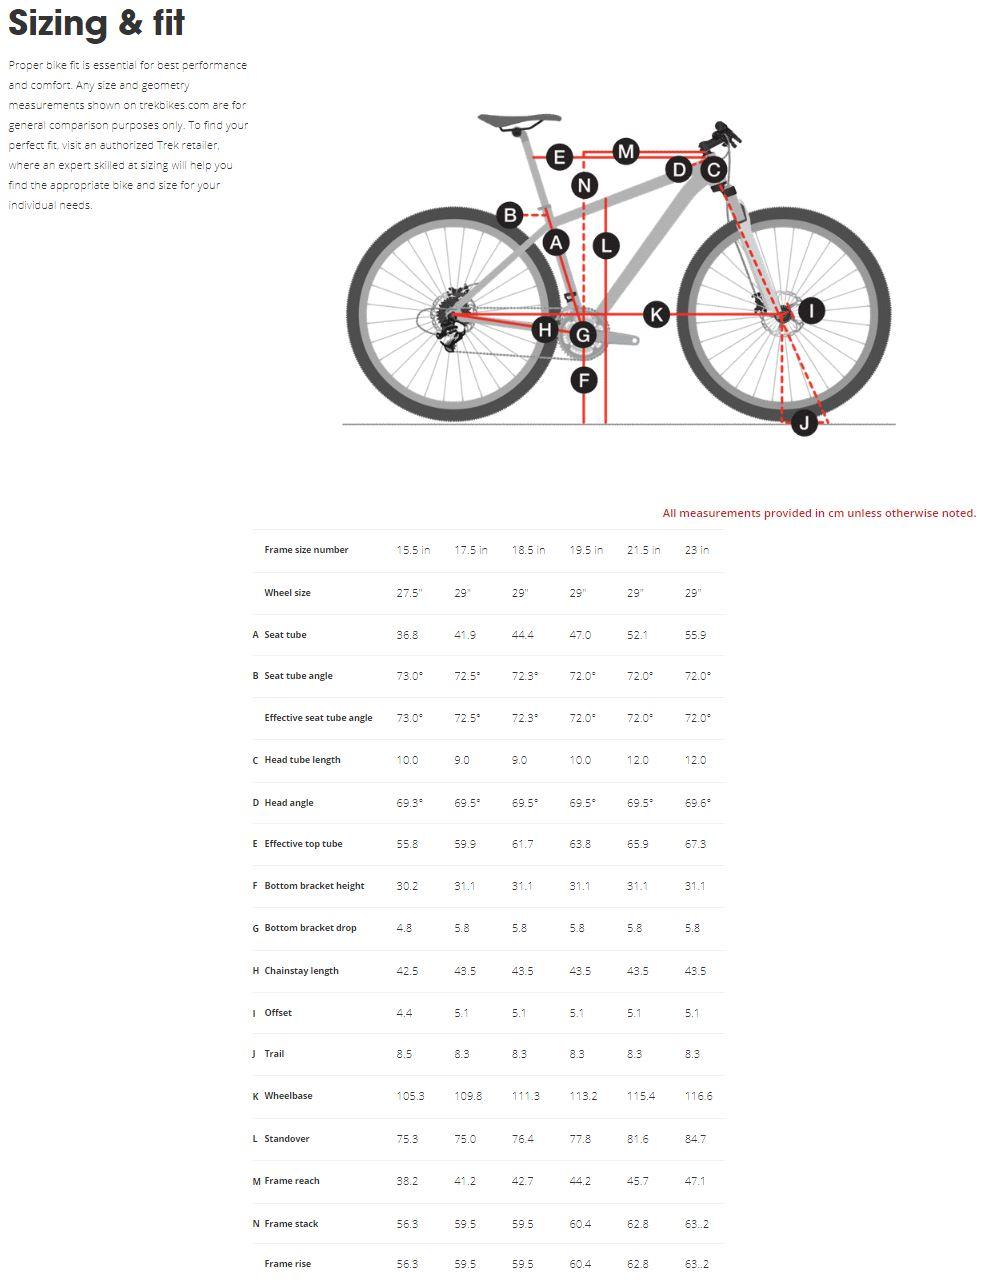 Trek Procaliber 6 geometry chart